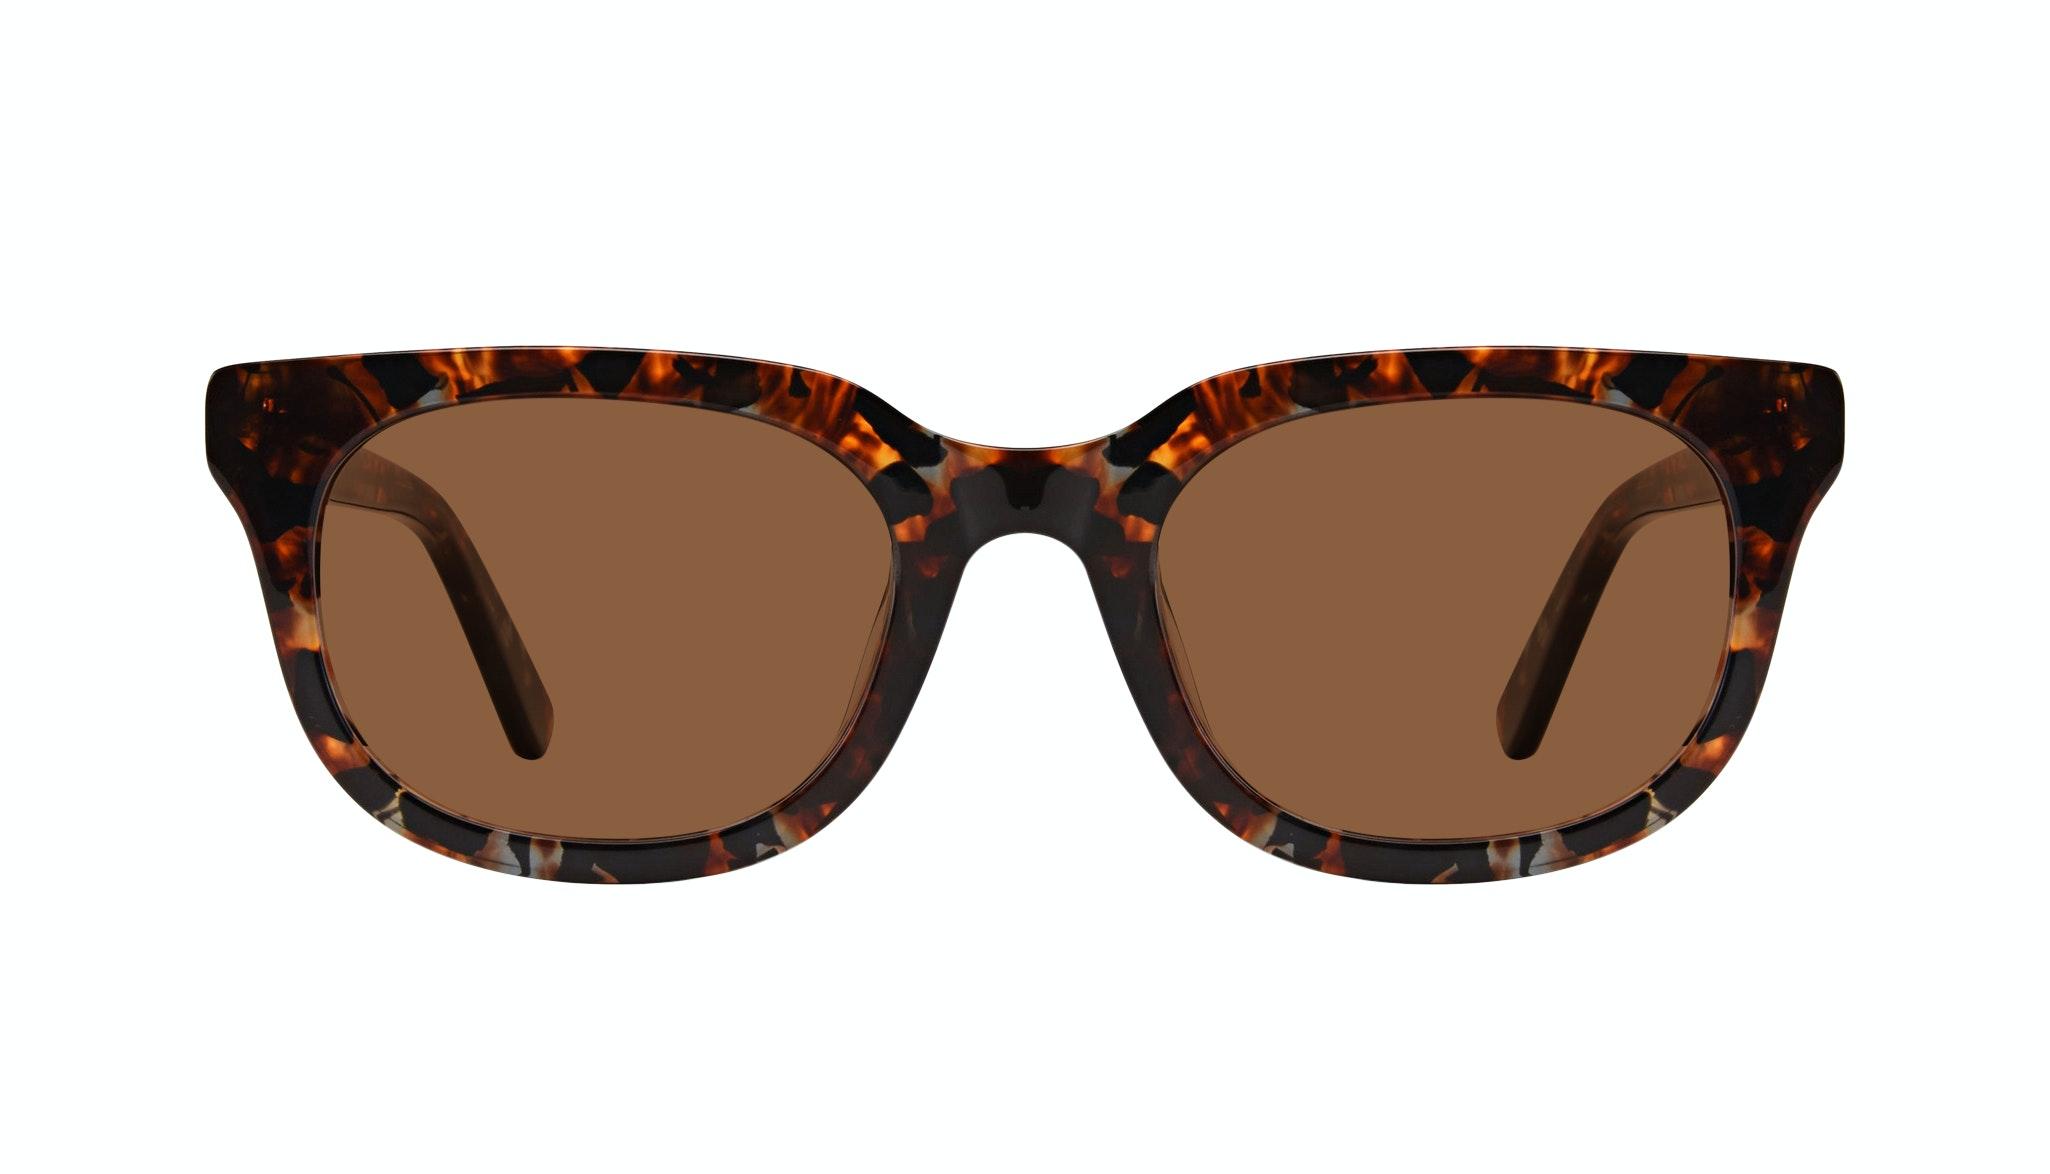 Affordable Fashion Glasses Square Sunglasses Men Stout Mahogany